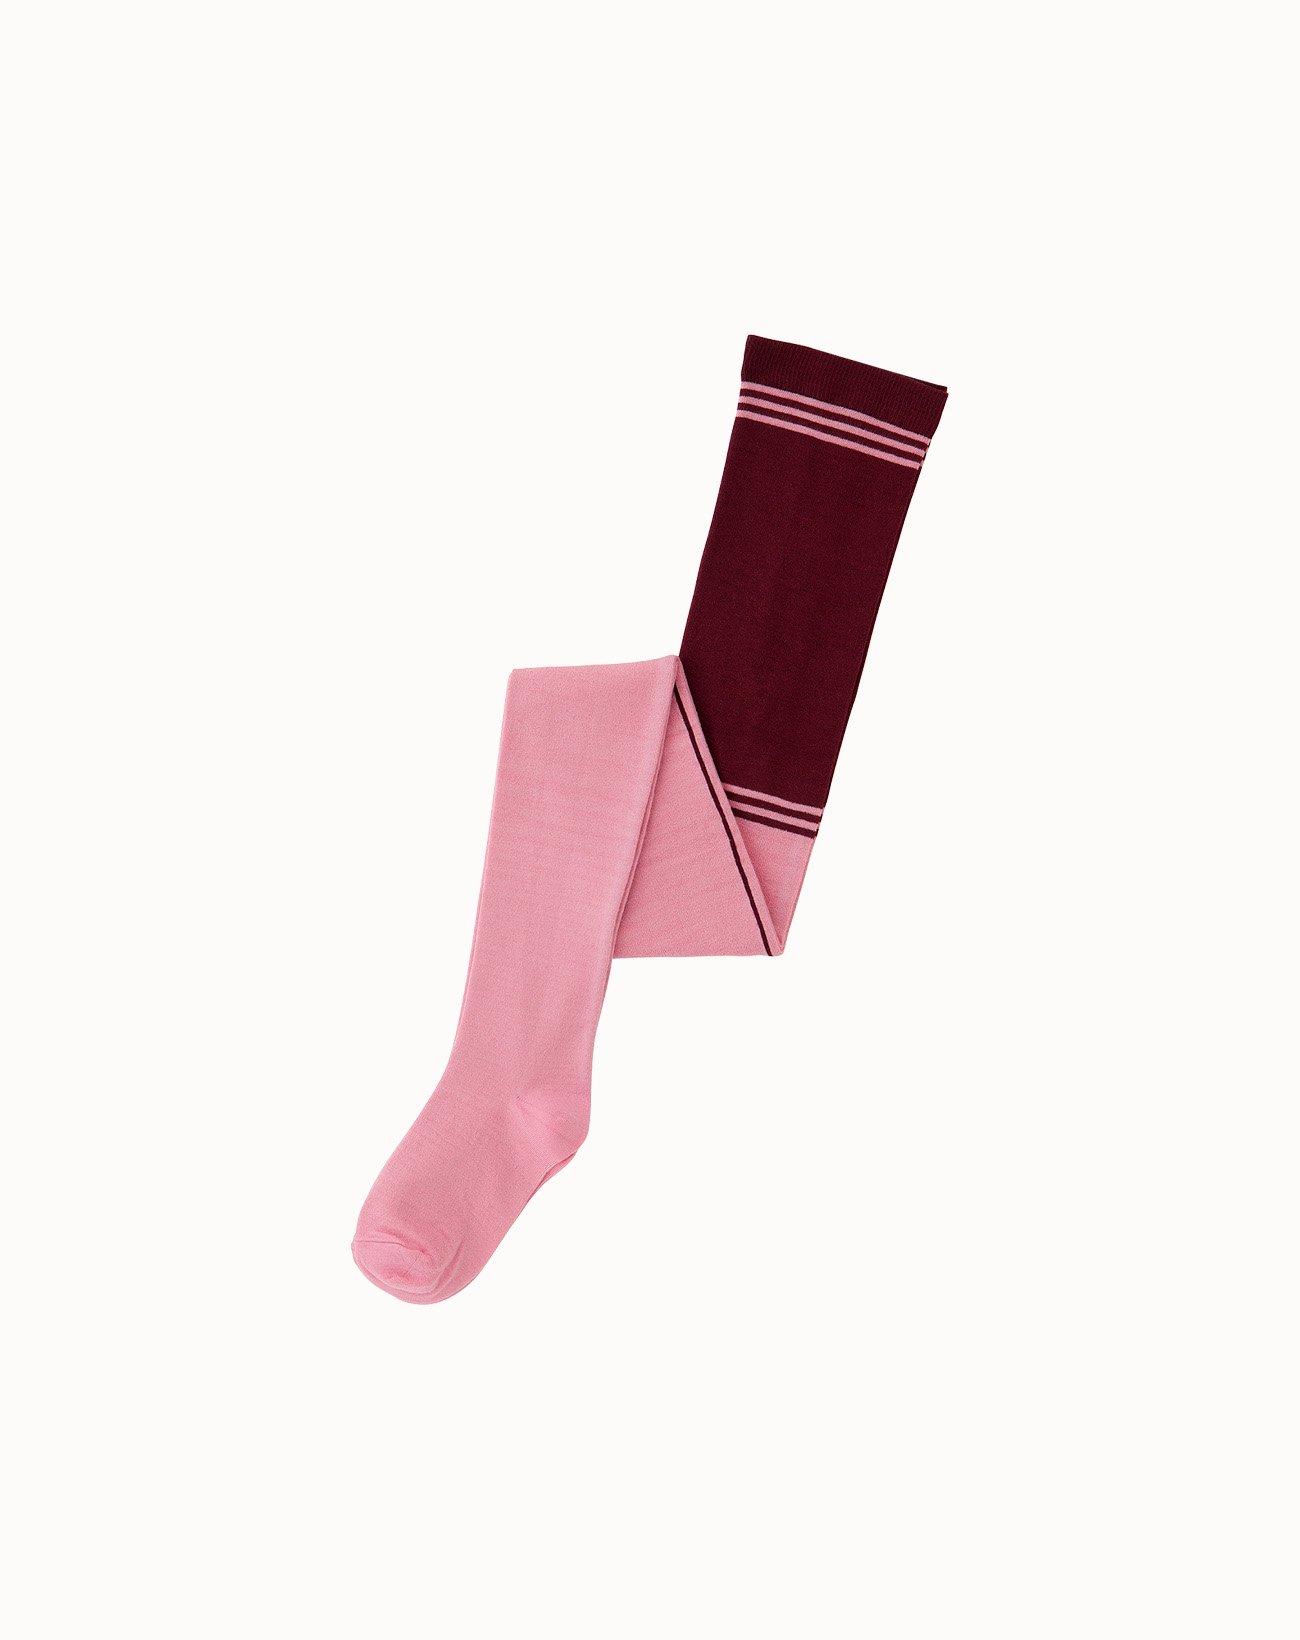 leur logette - Jersey Tights - Pink